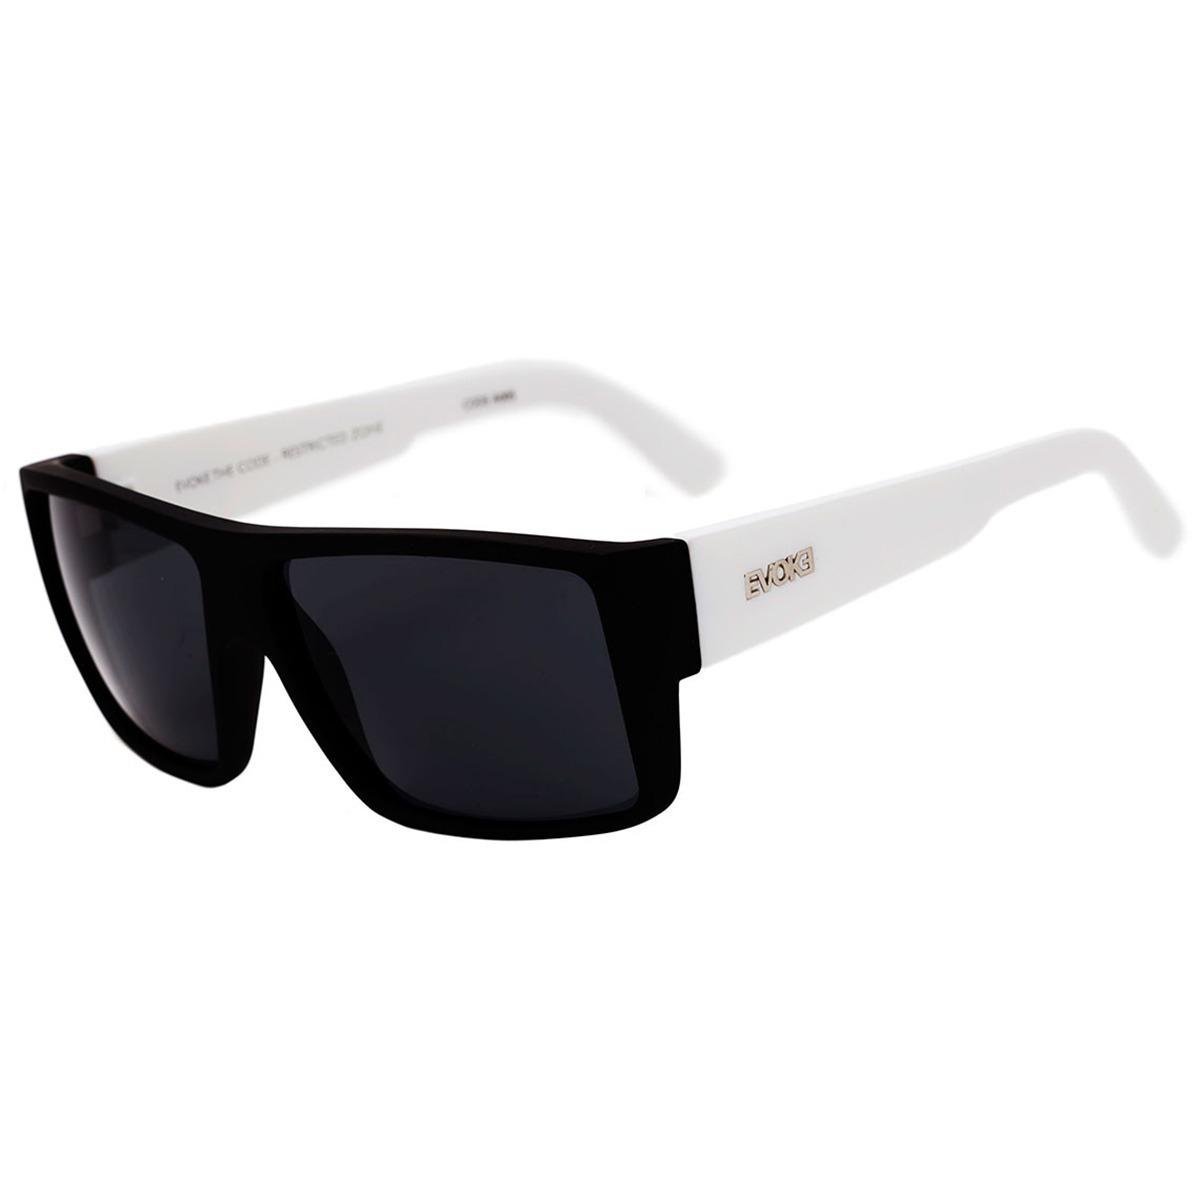 oculos sol evoke the code preto fosco branco original solar. Carregando  zoom. ced71c3ef1